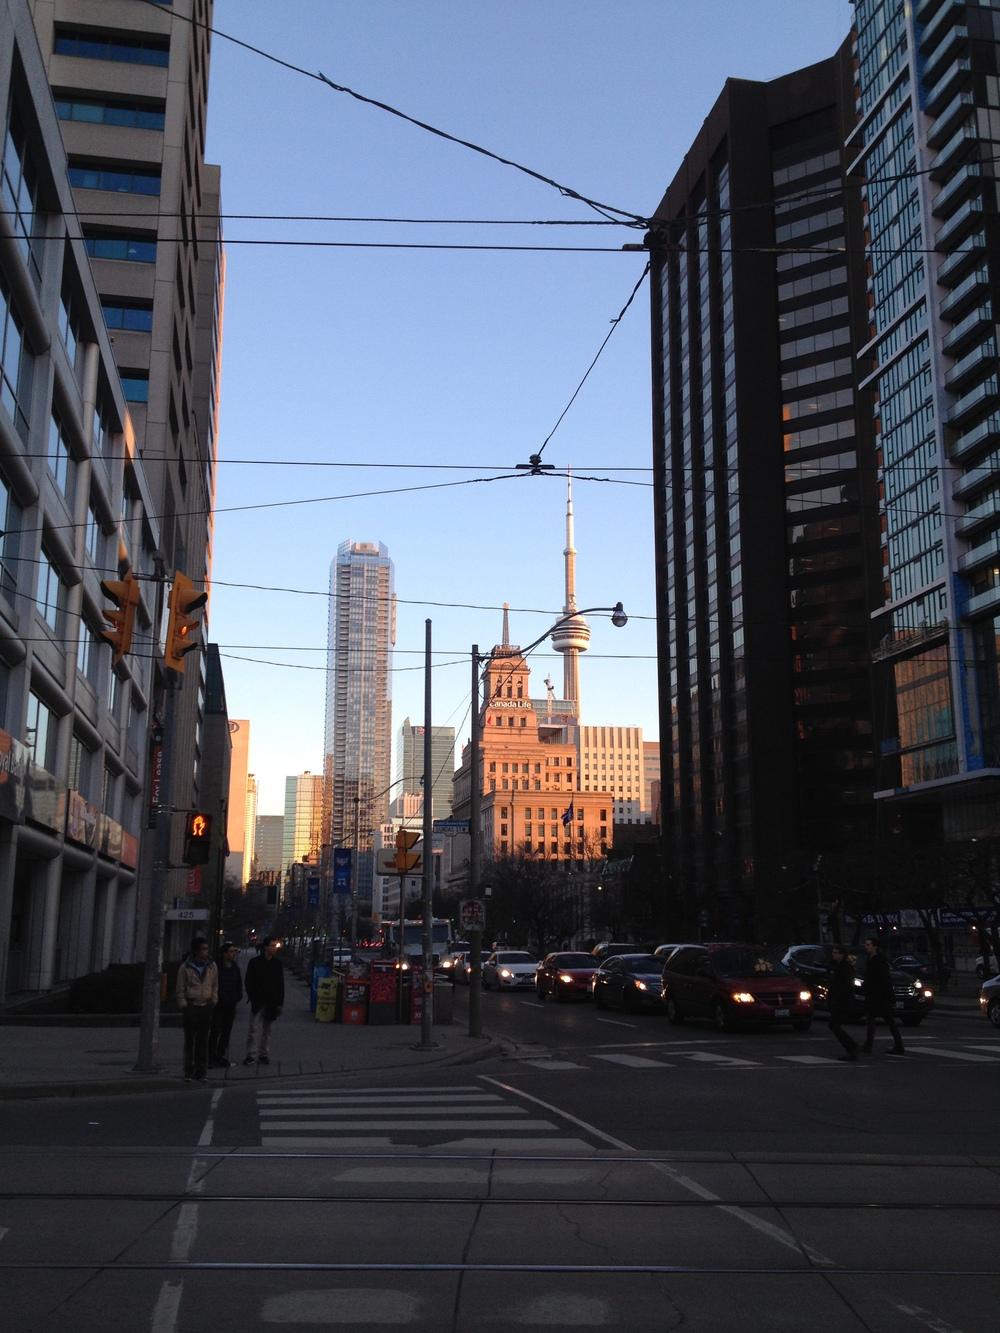 Toronto, Ontario, Canada Mar 2014